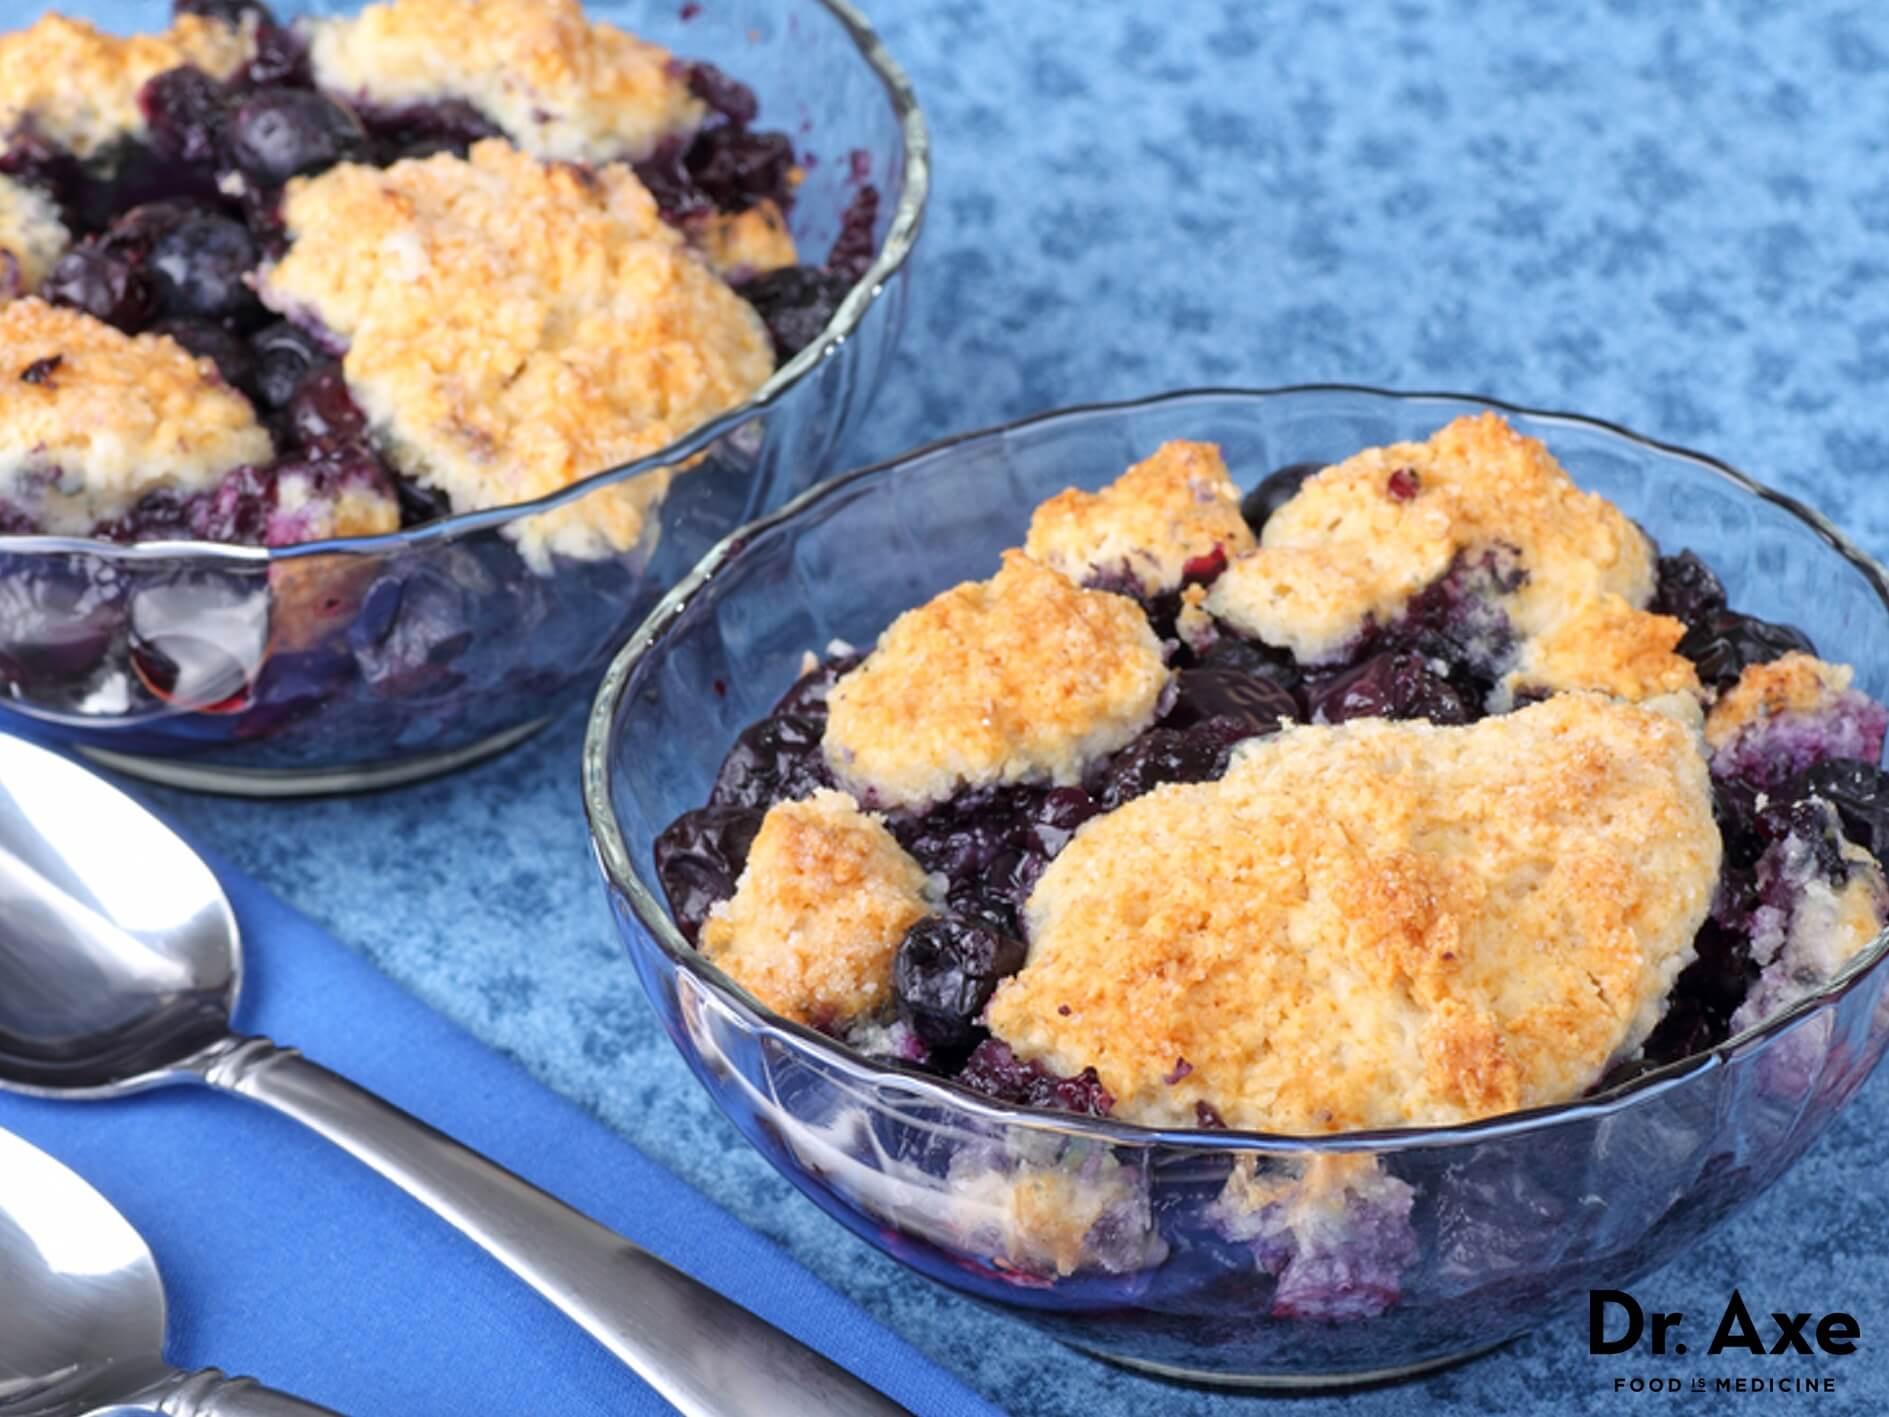 Blueberry Dessert Healthy  Healthy Blueberry Cobbler Recipe Dr Axe